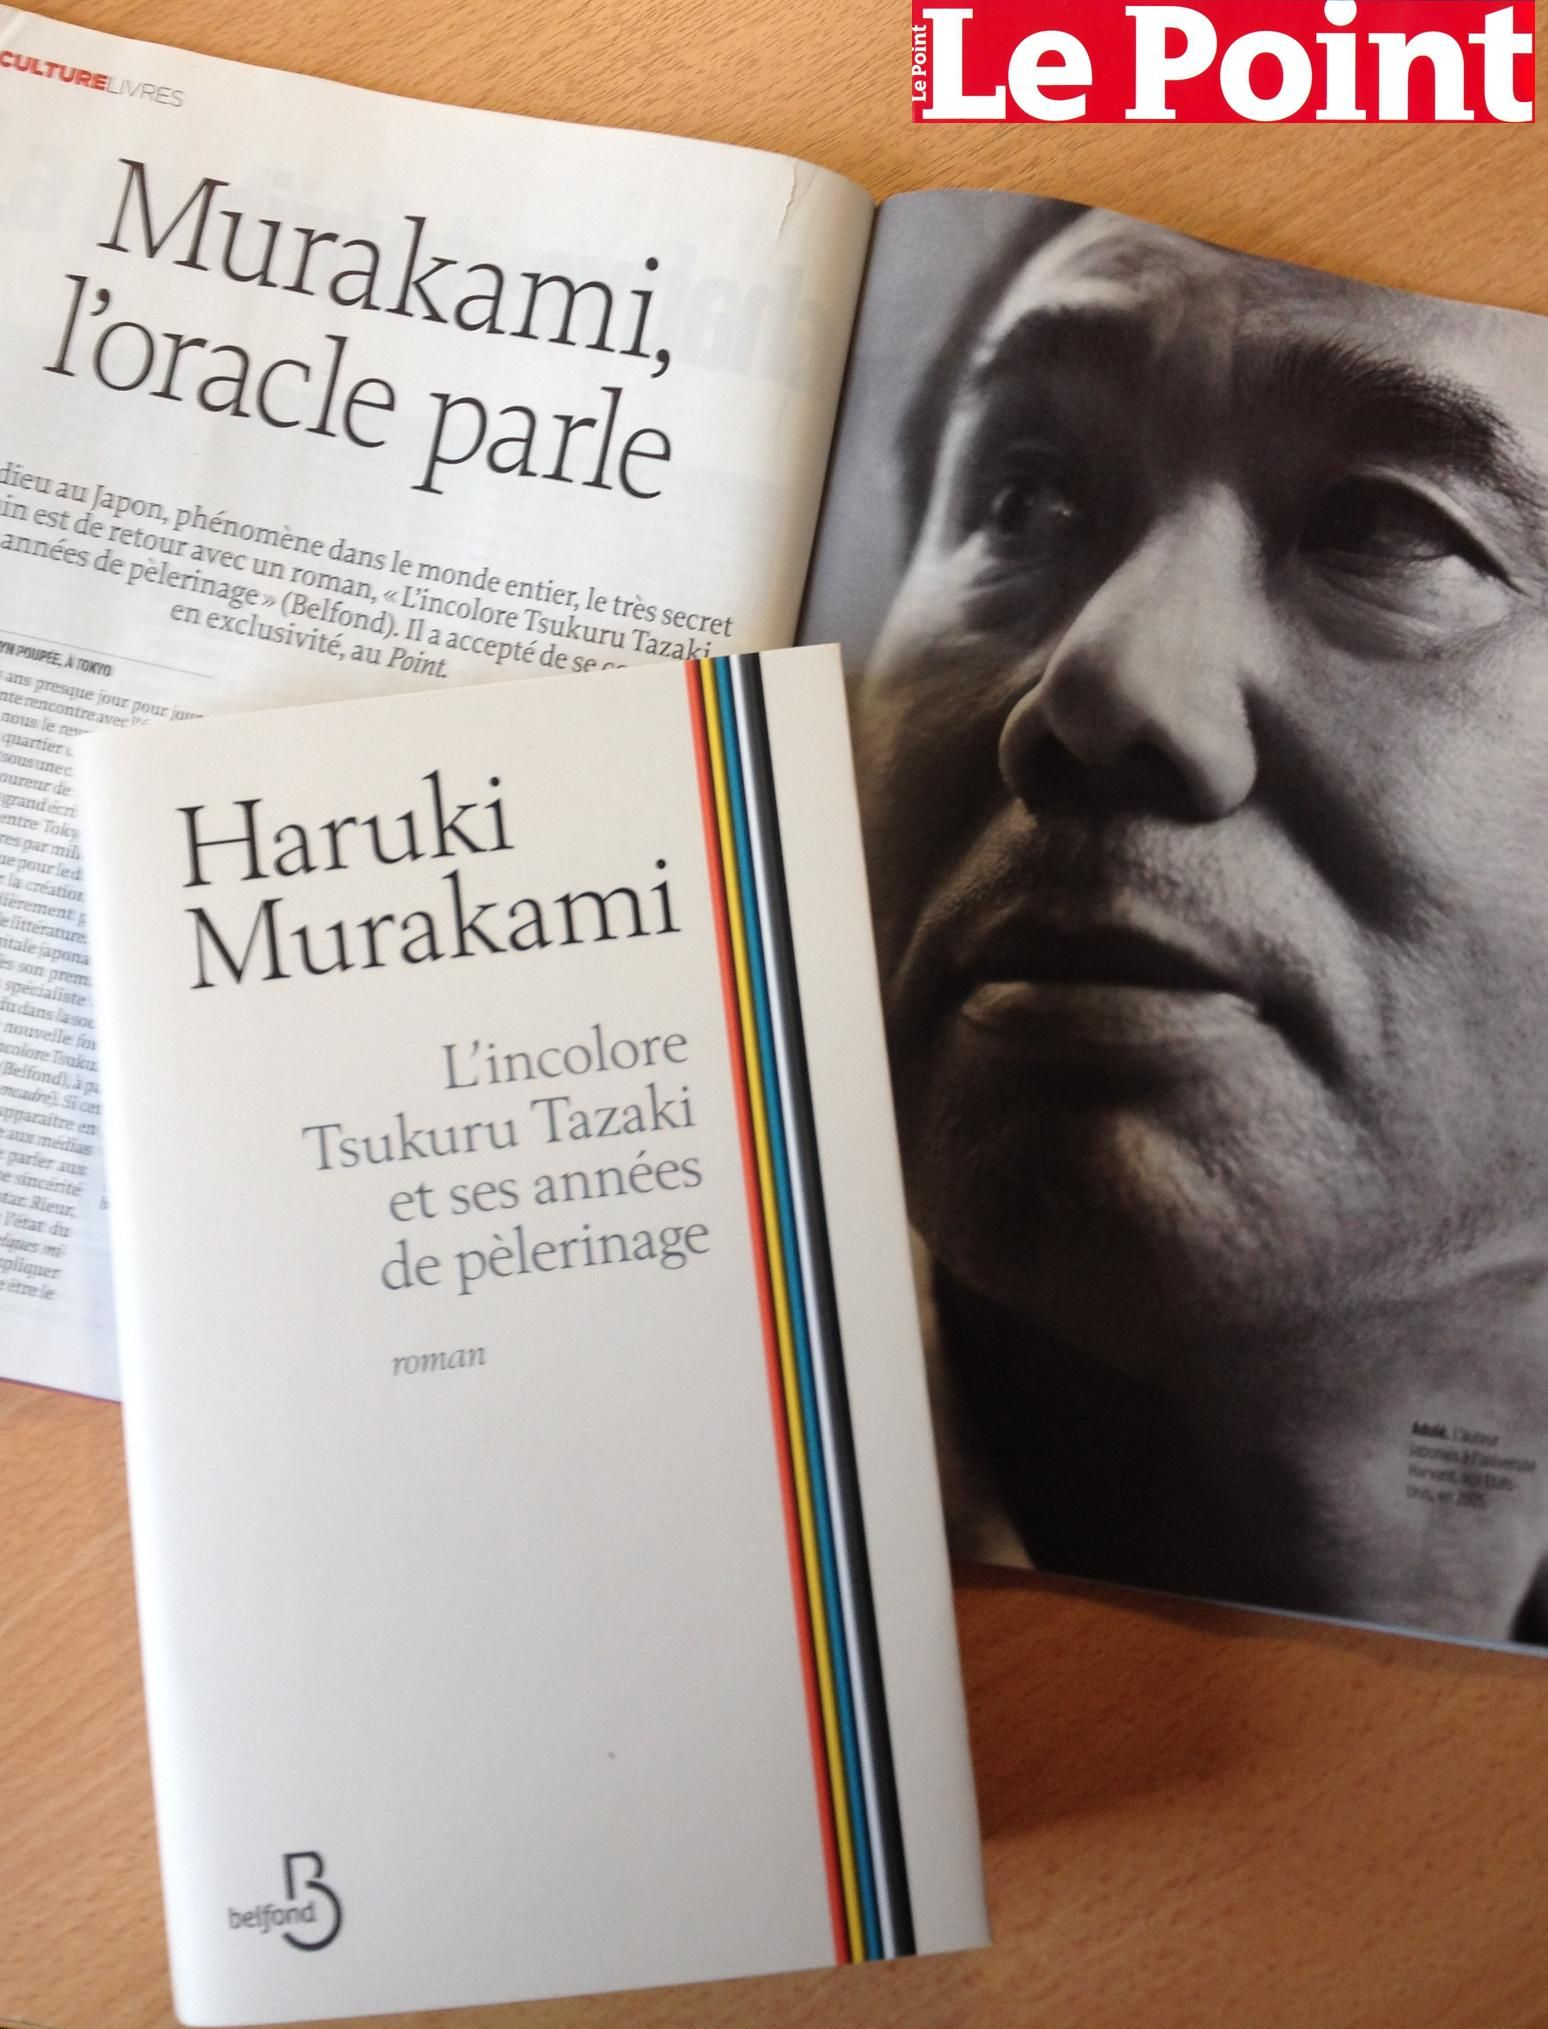 Haruki Murakami Interview Exclusive Le Point